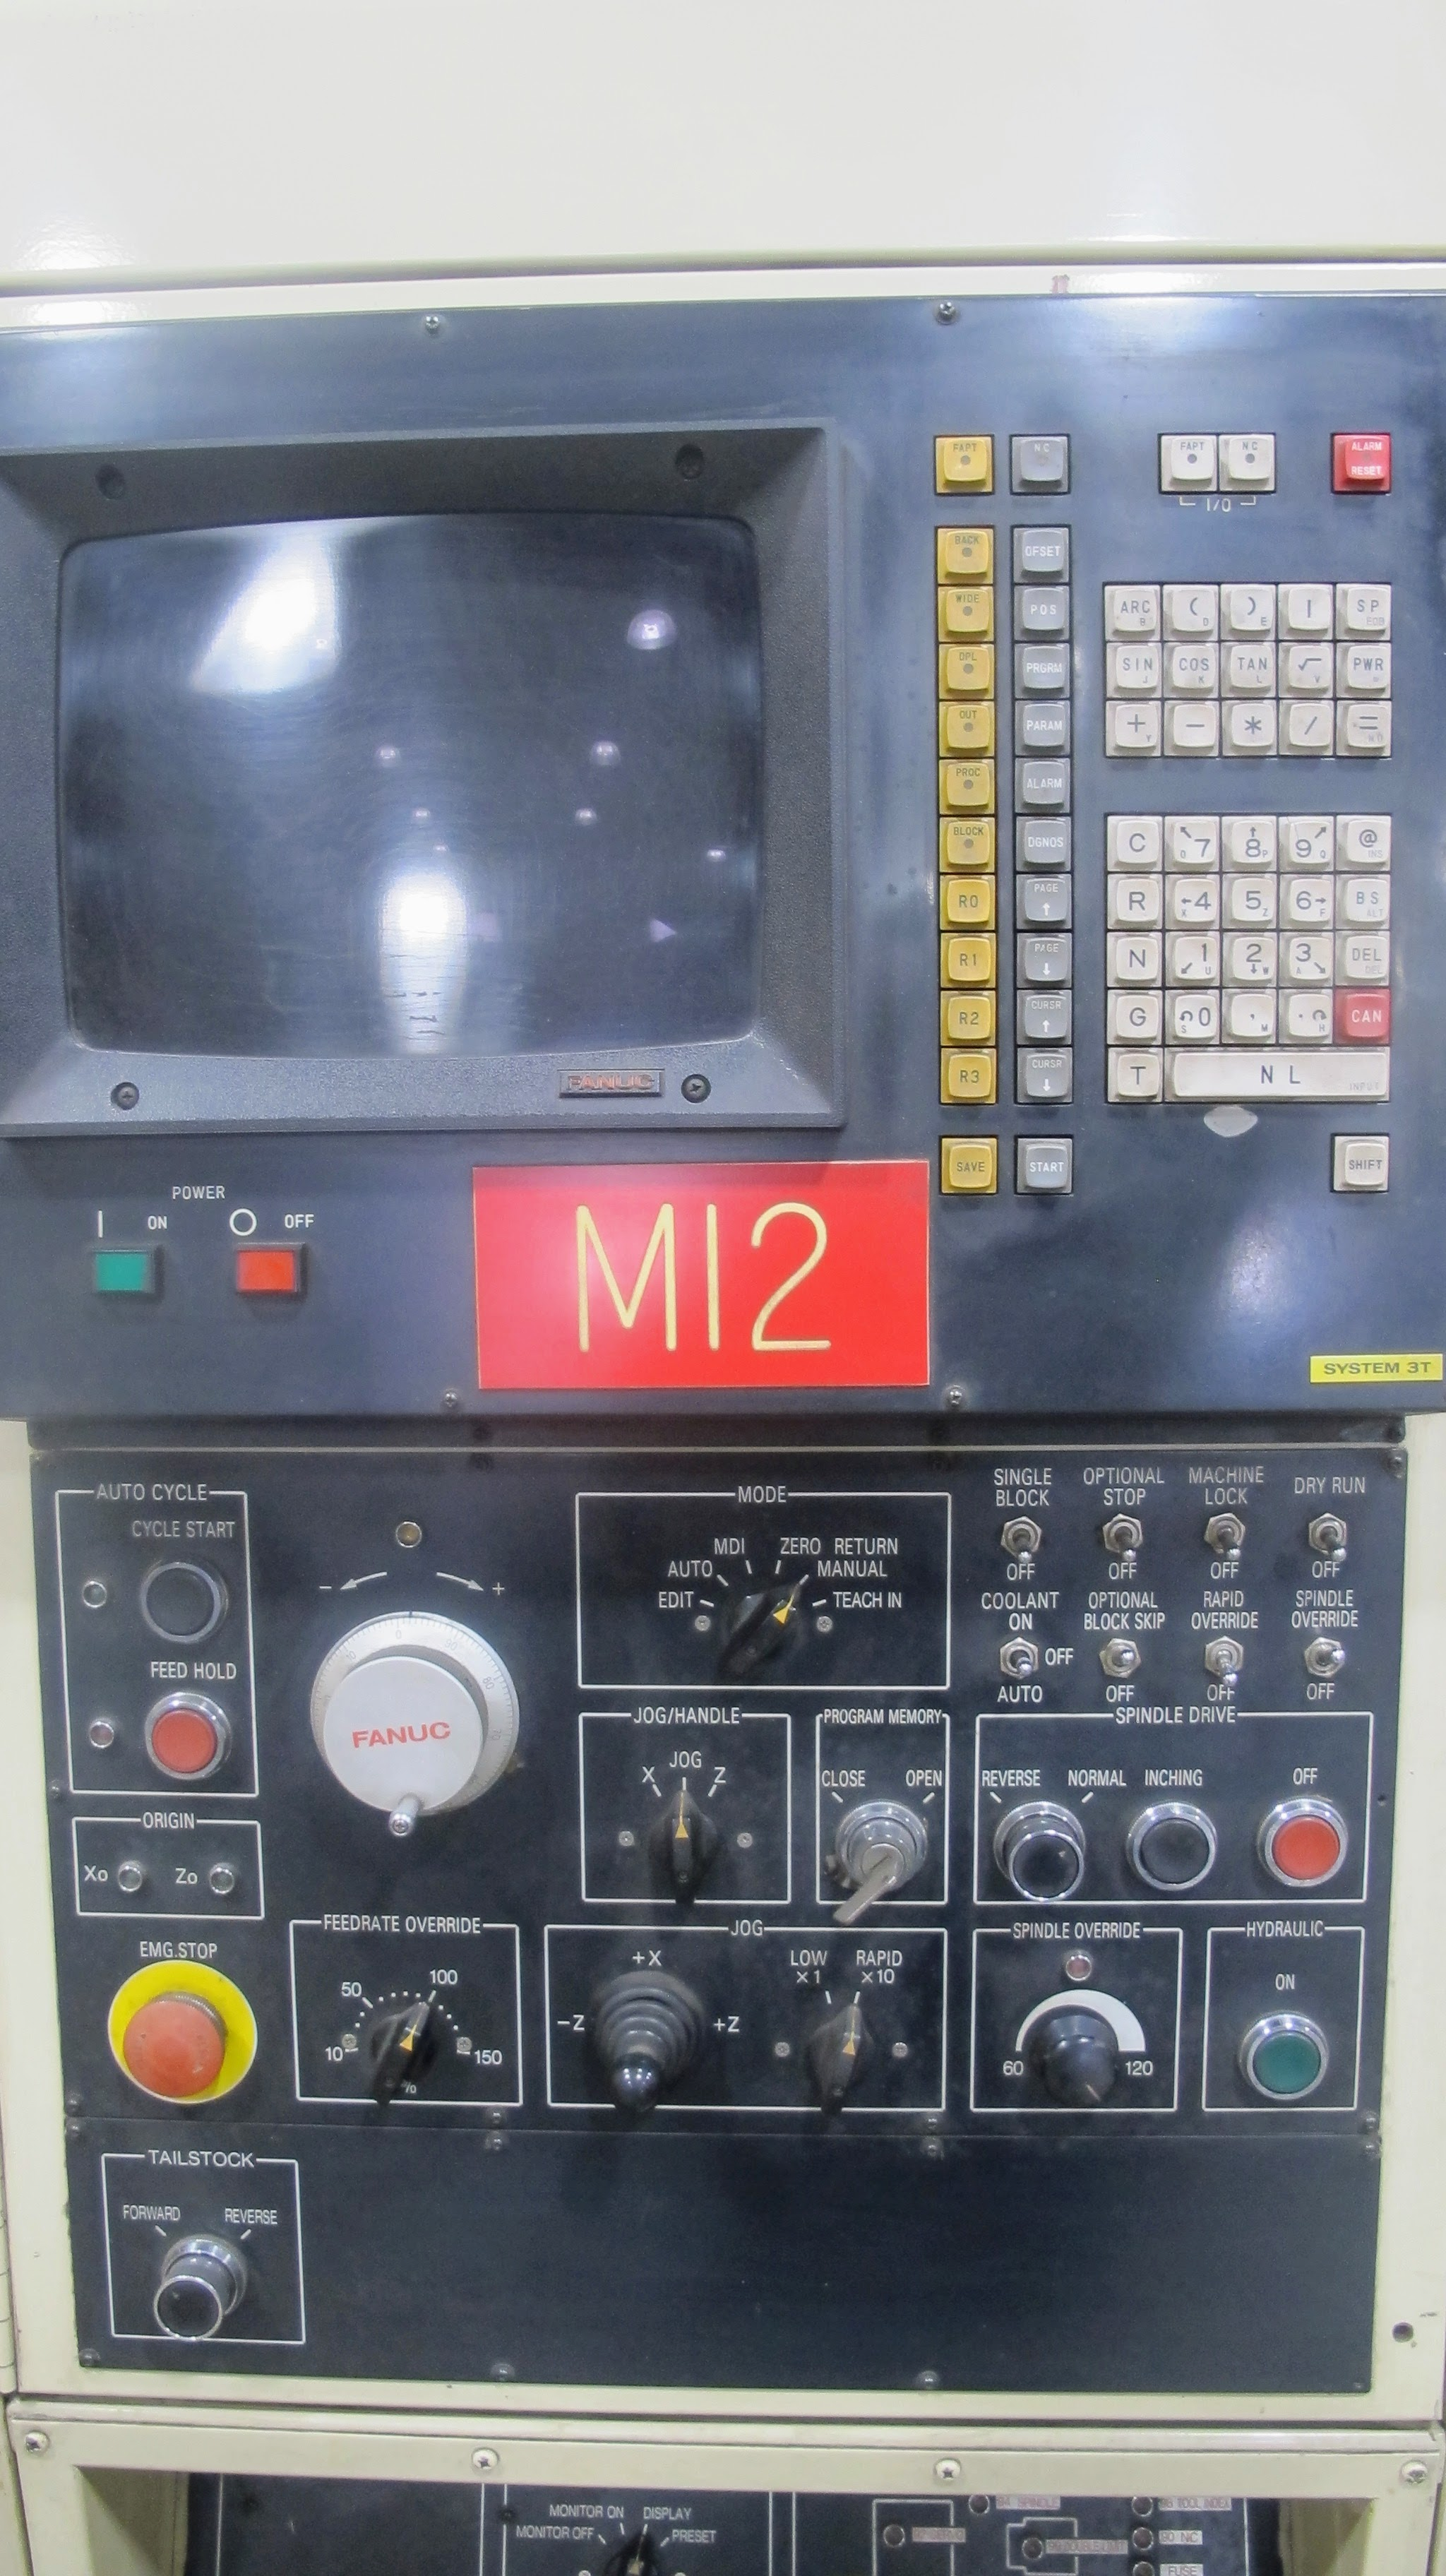 "OKUMA ACT-4 CNC LATHE W/12"" 3 JAW CHUCK, FANUC CONTROL, TAIL STOCK, ATC-12 W/10 TOOL HOLDERS, - Image 3 of 17"